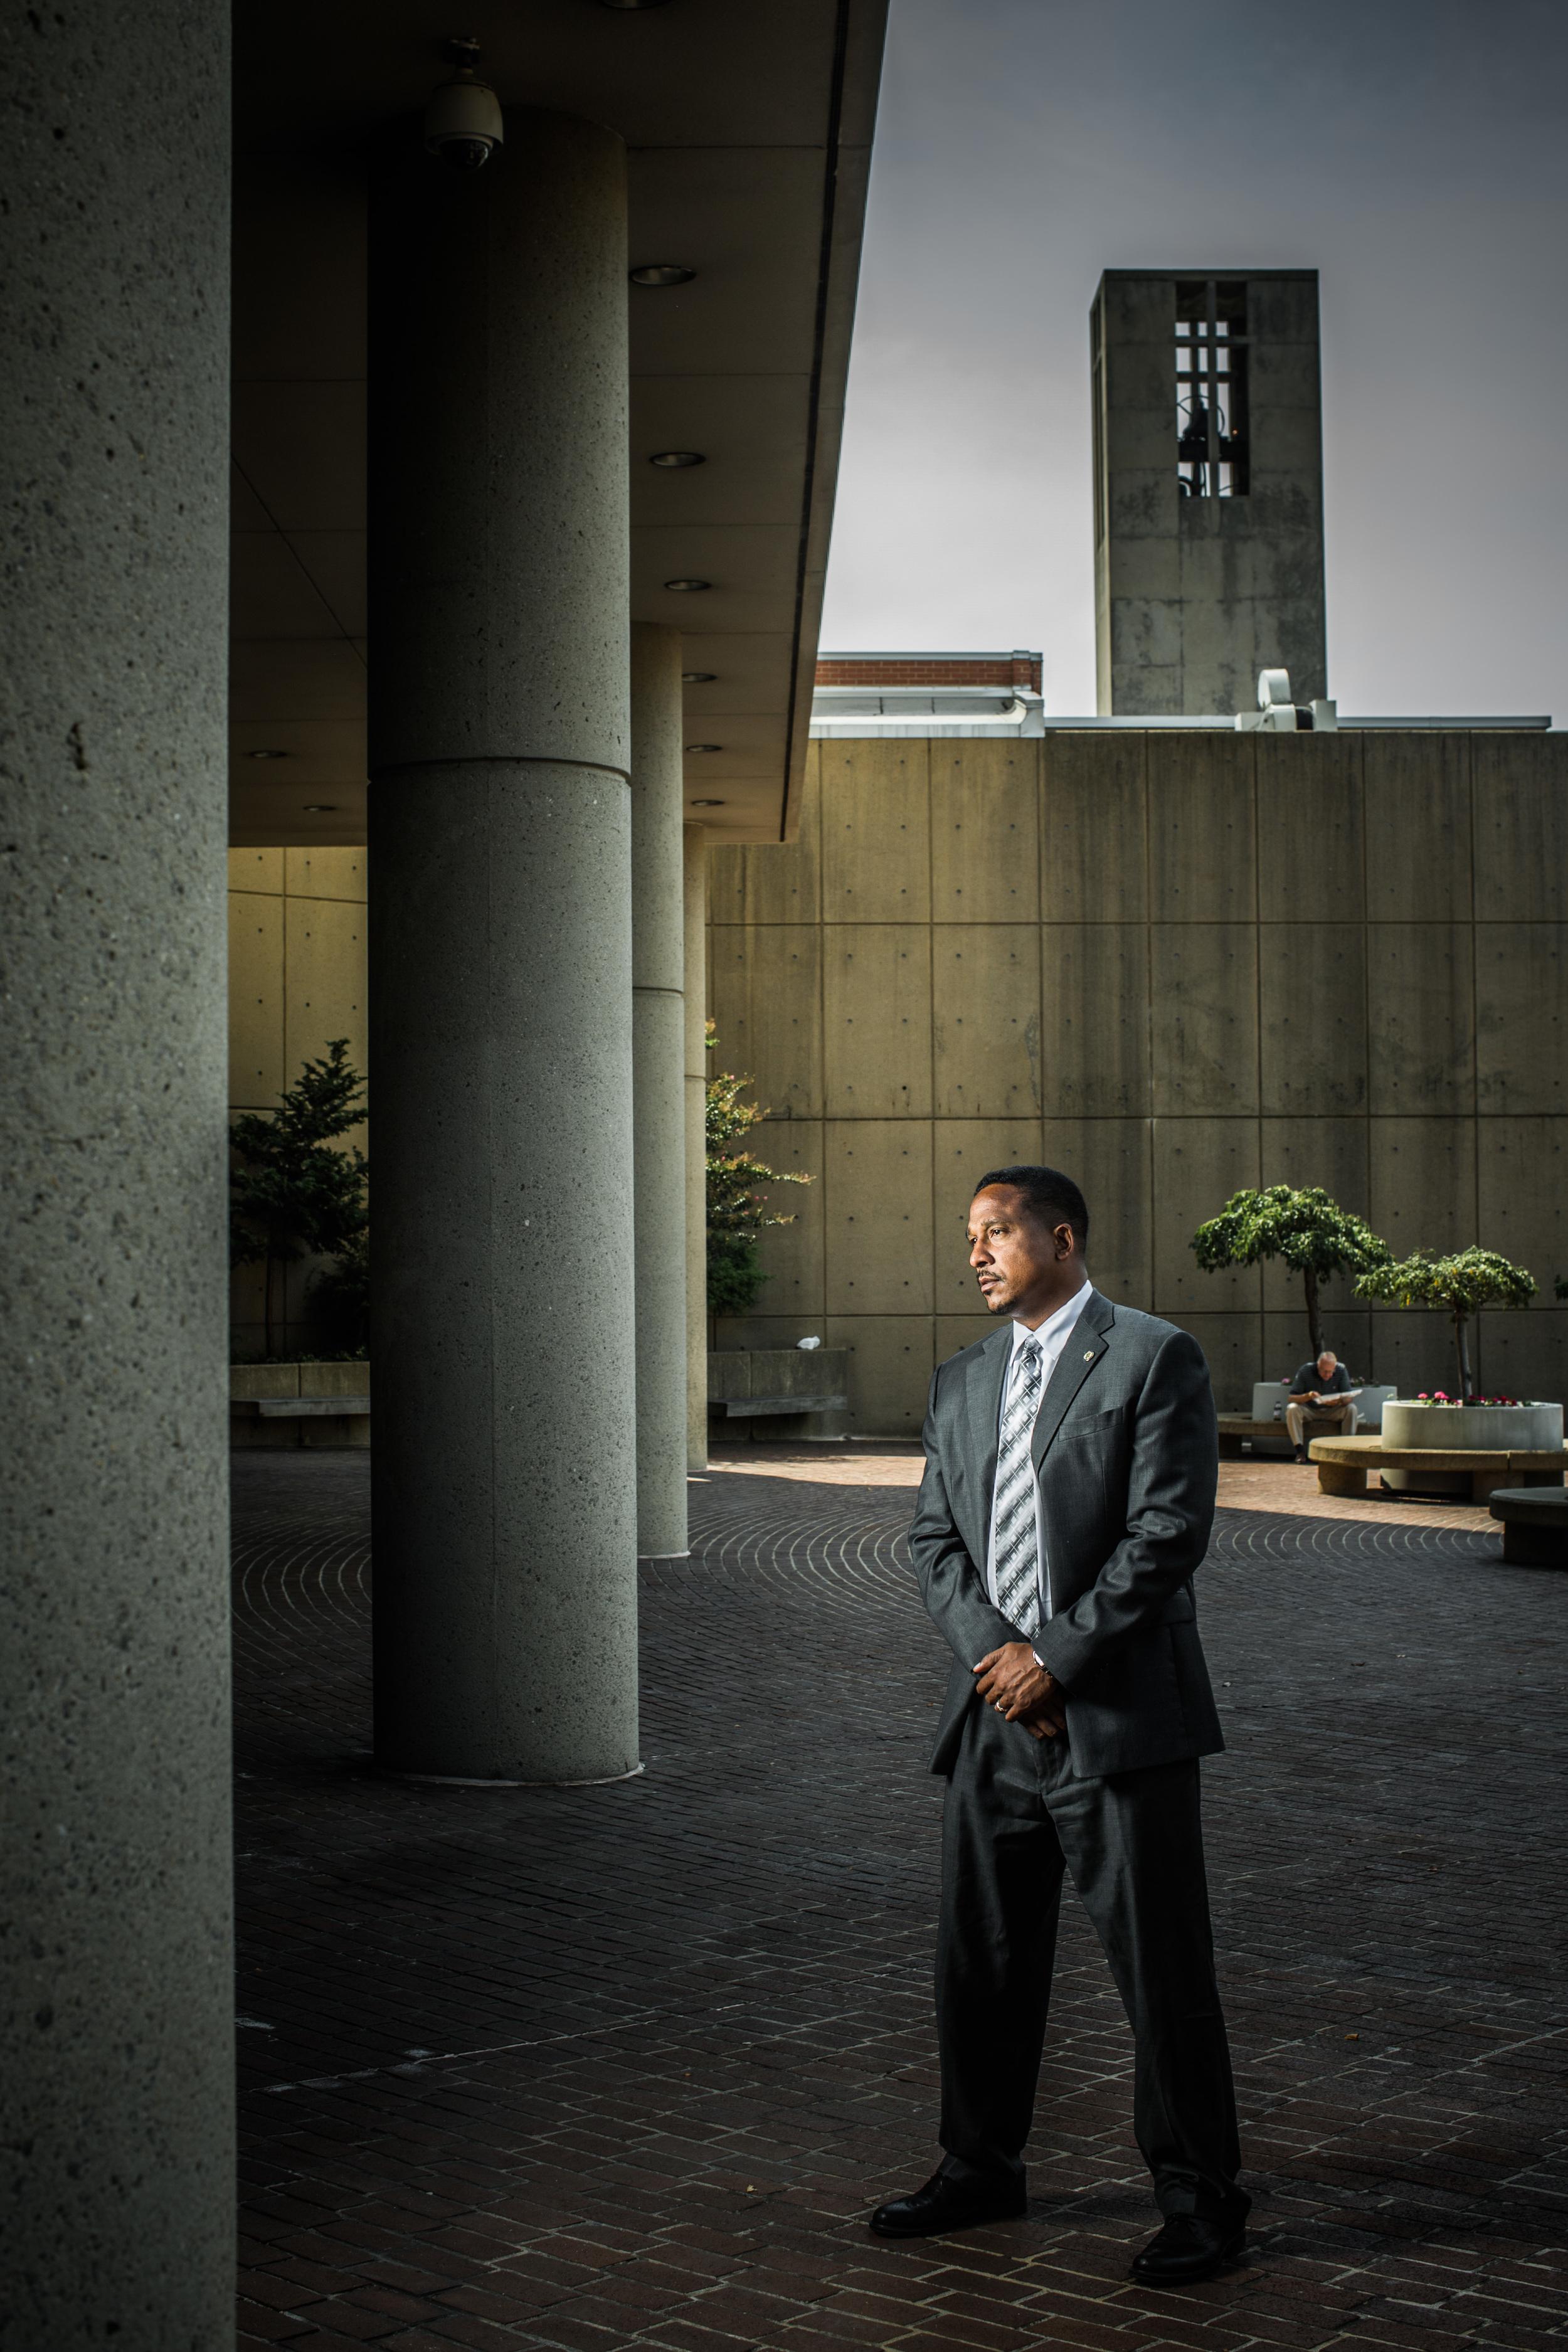 US District Attorney for DC Ronald Machen